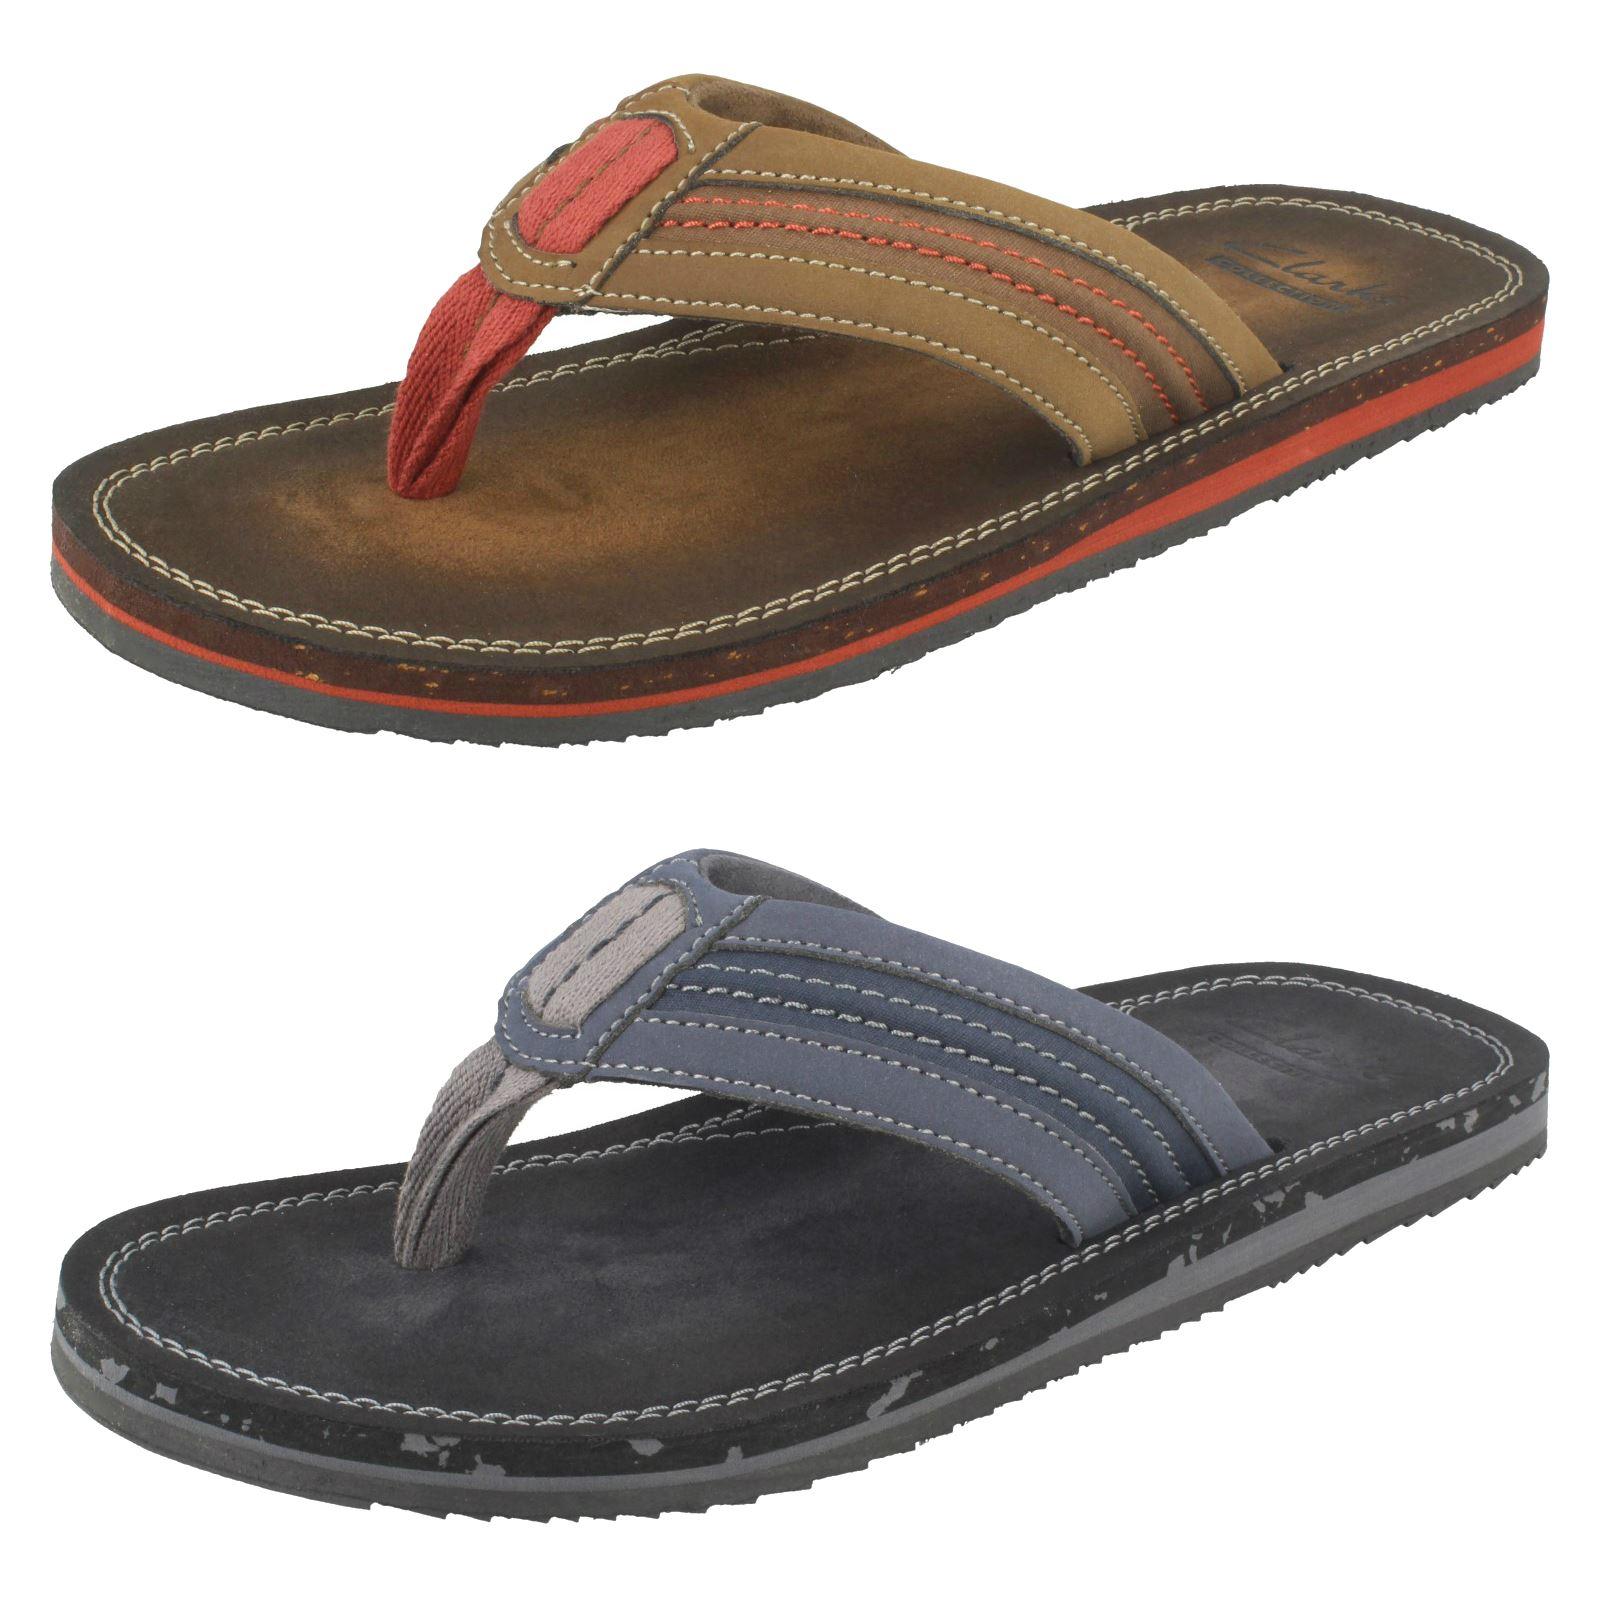 Details about Mens Clarks Flip Flops Toe Post Sandals  Riverway Sun